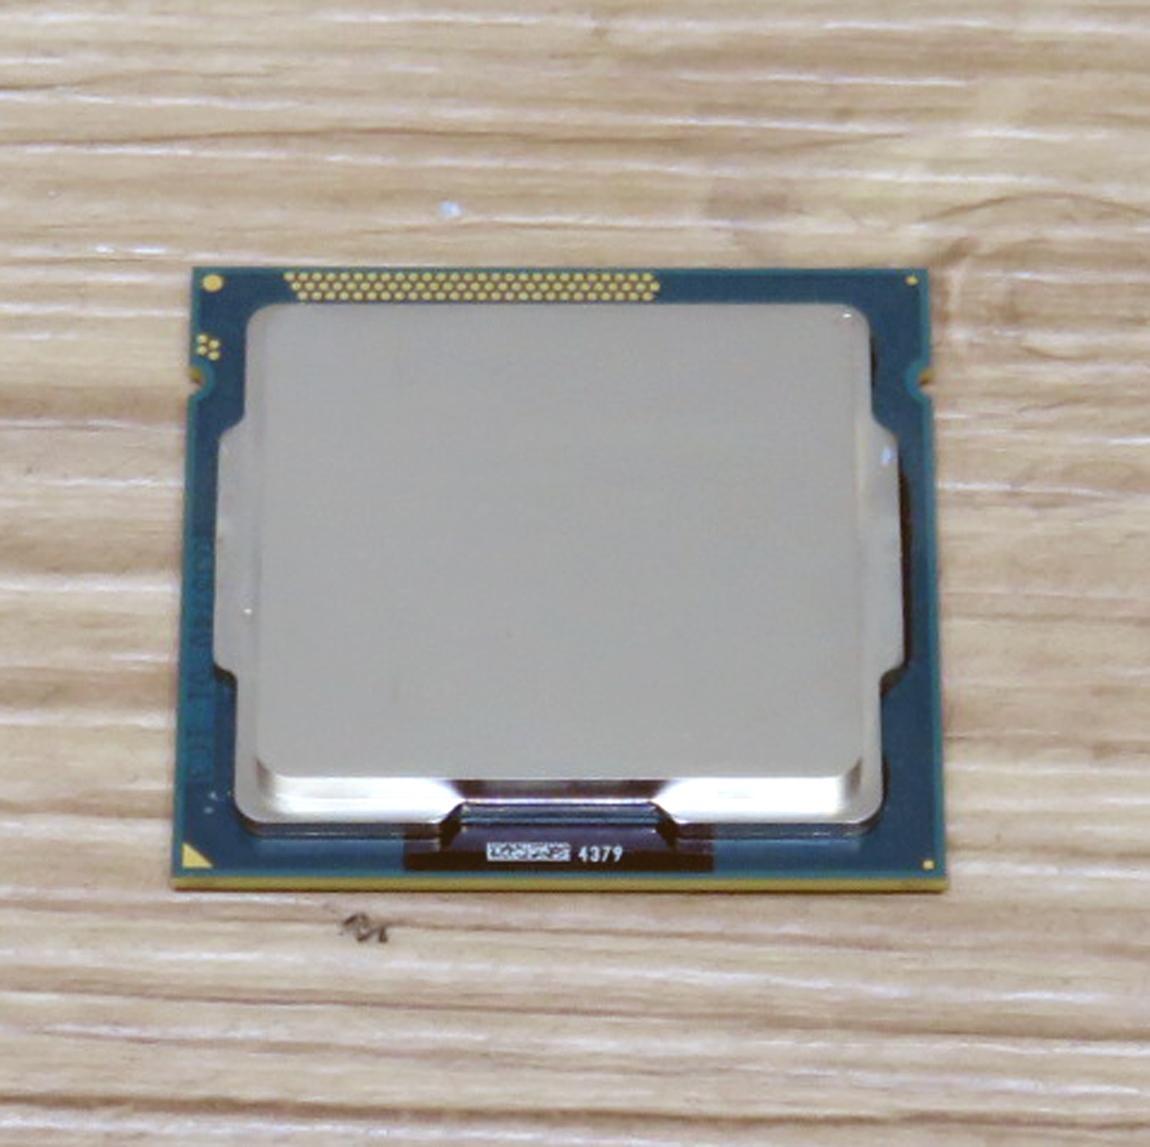 ★≪中古品≫Intel Xeon E3-1220V2 3.1Ghz[t050911]_画像1